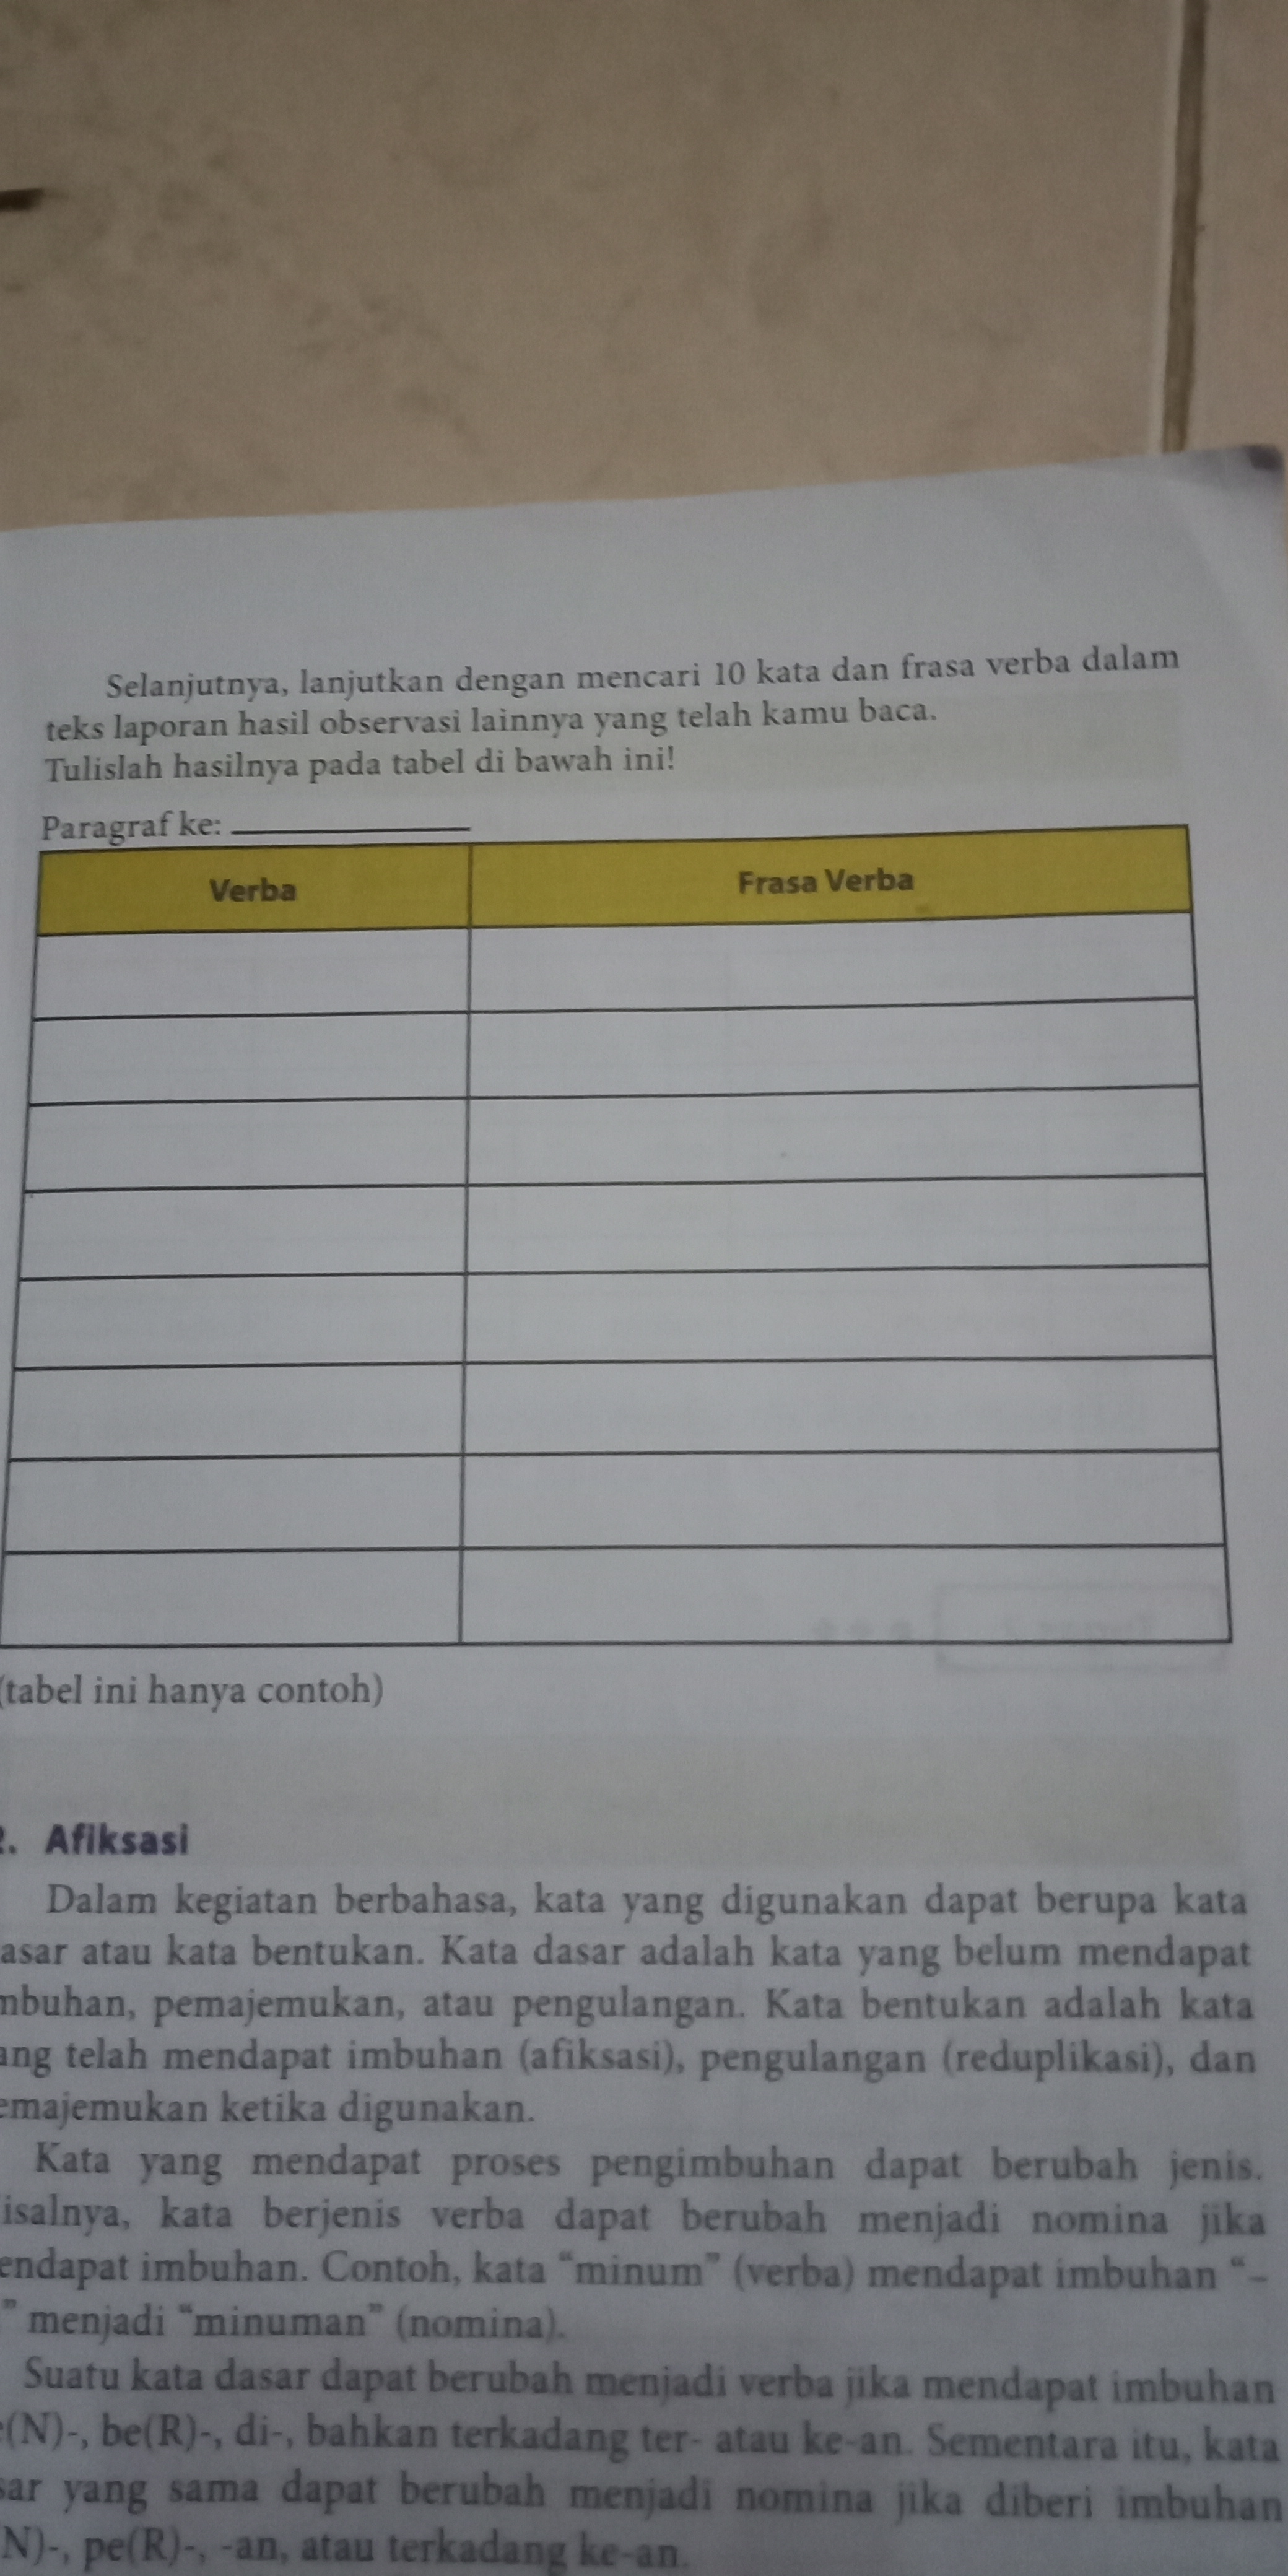 Perhatikan Tabel Verba Sebutkan Kata Verba Dan Frasa Verba Max 8